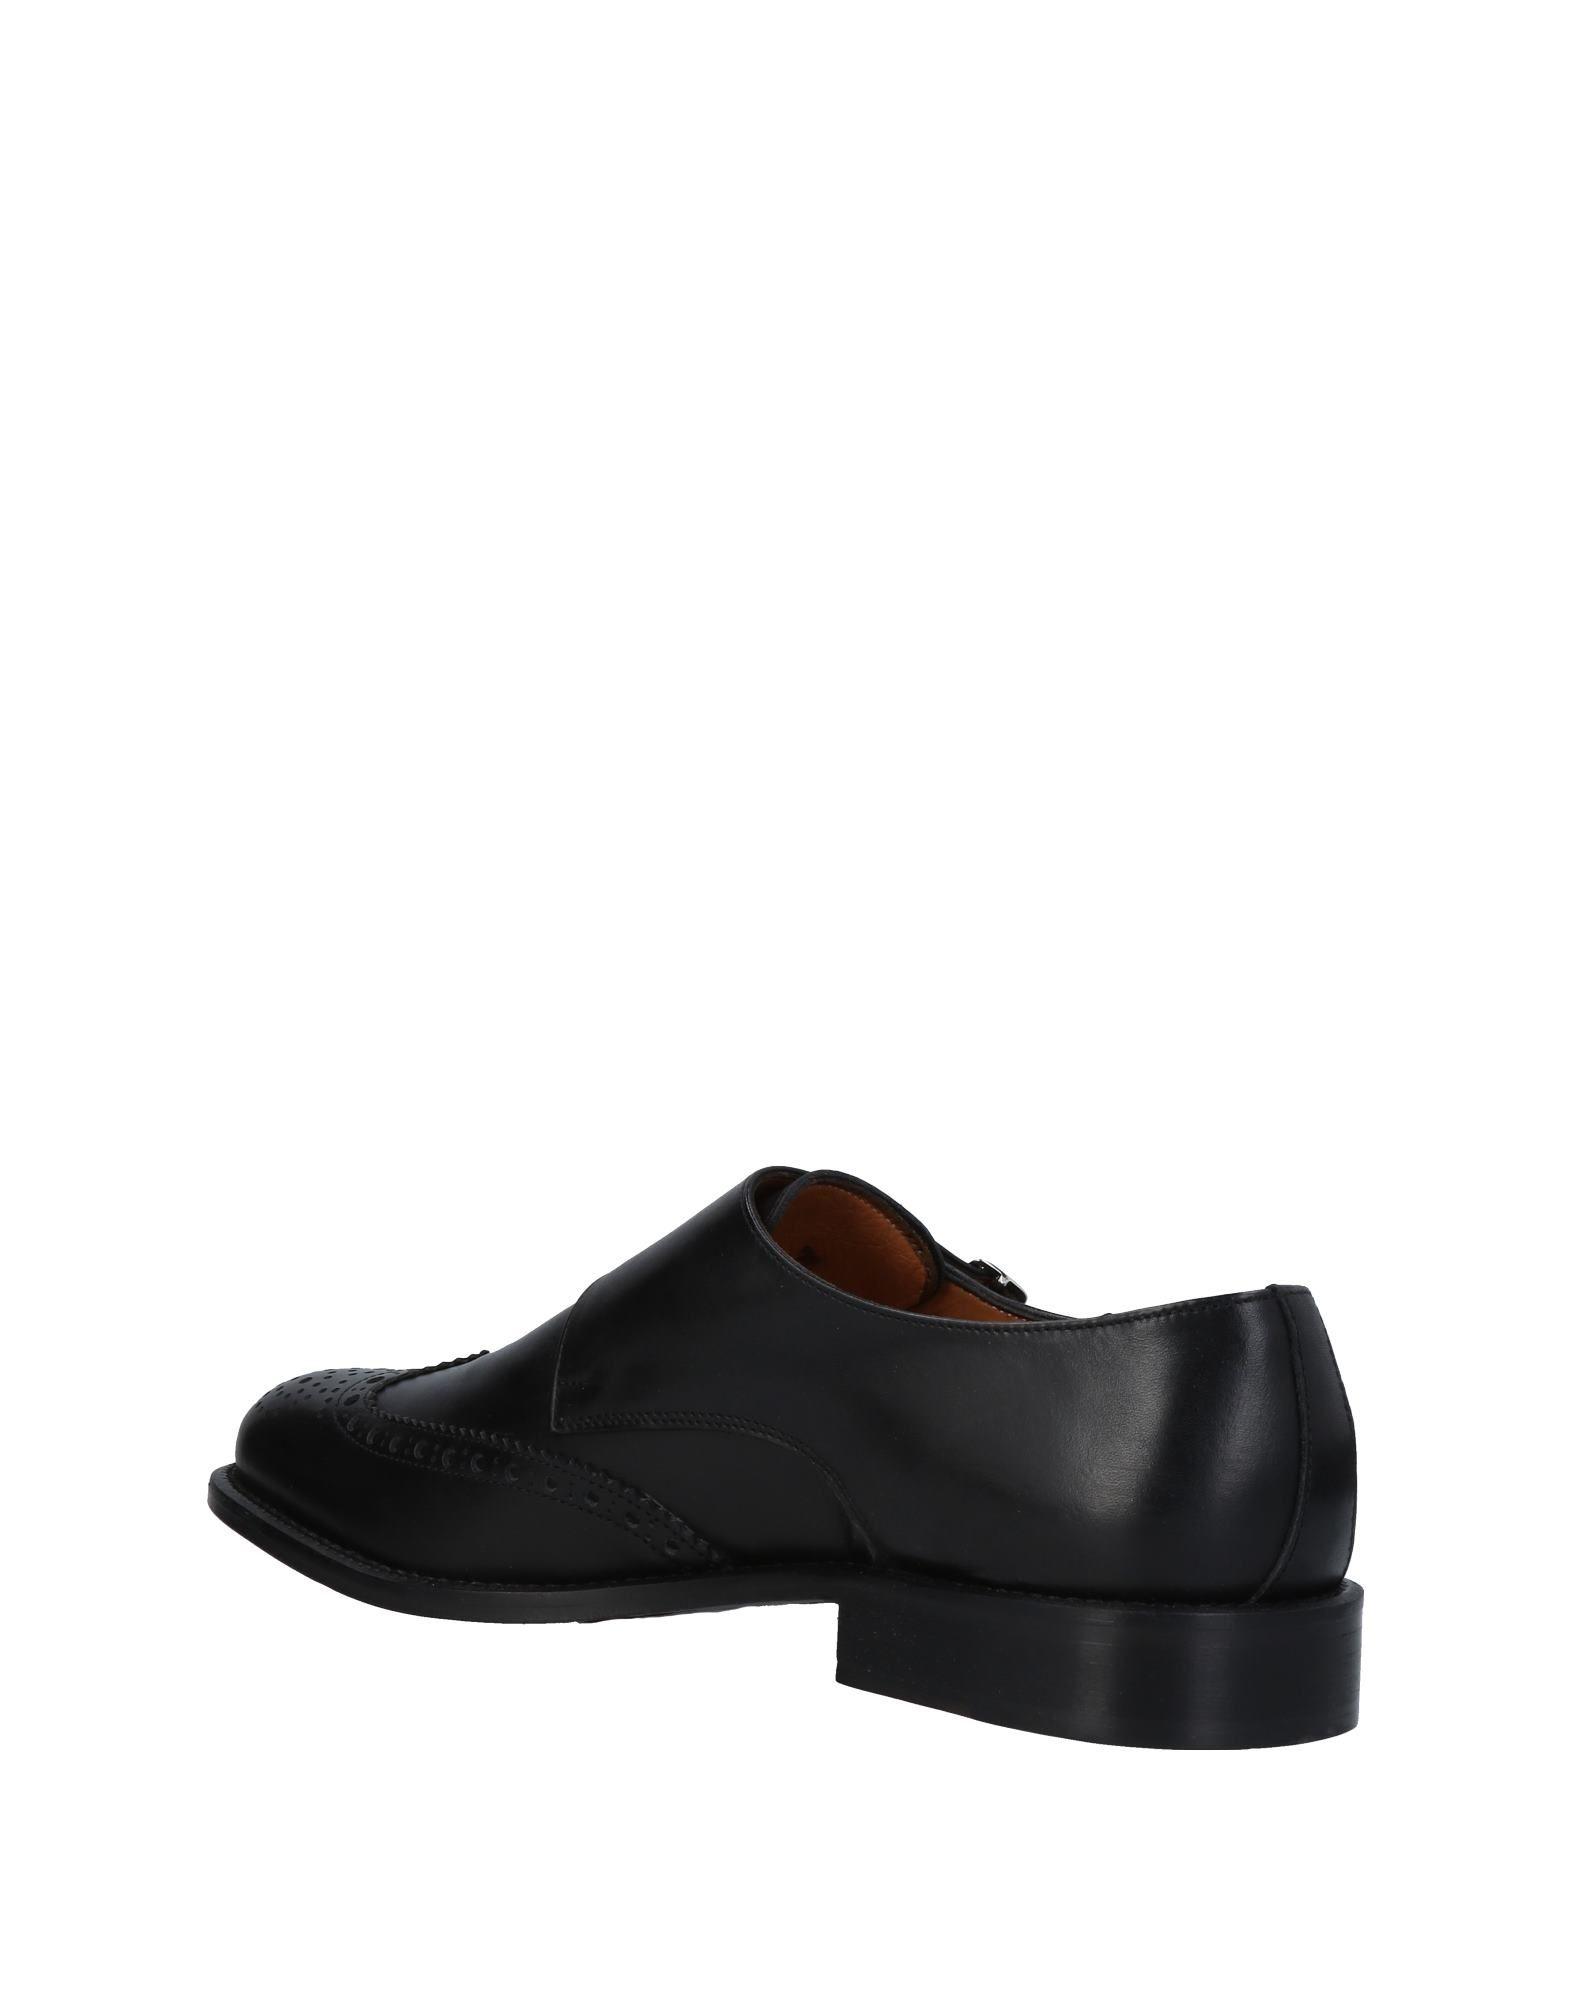 Rabatt echte Schuhe Herren Brawn's Mokassins Herren Schuhe  11443395PR 69d66a